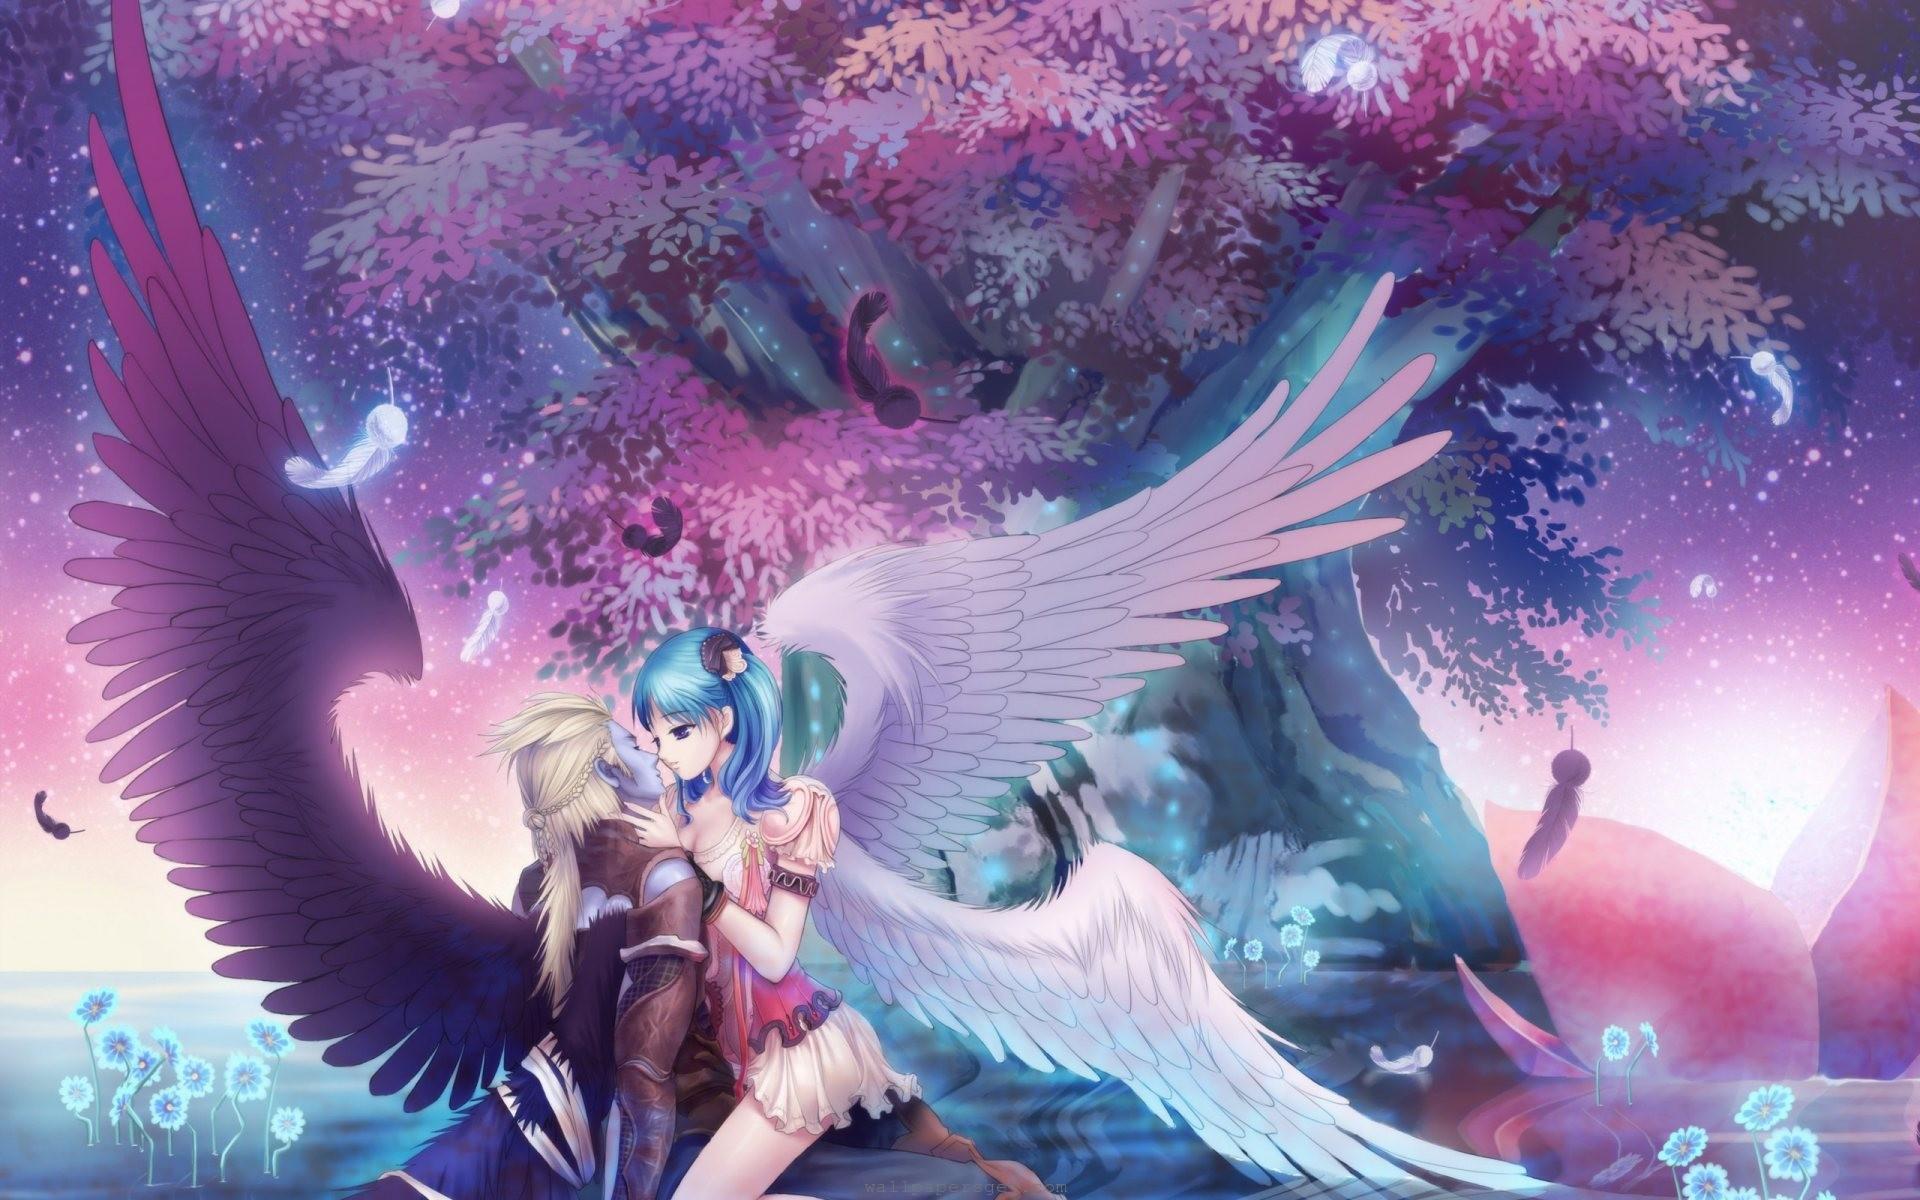 Anime angels pussy photos 56